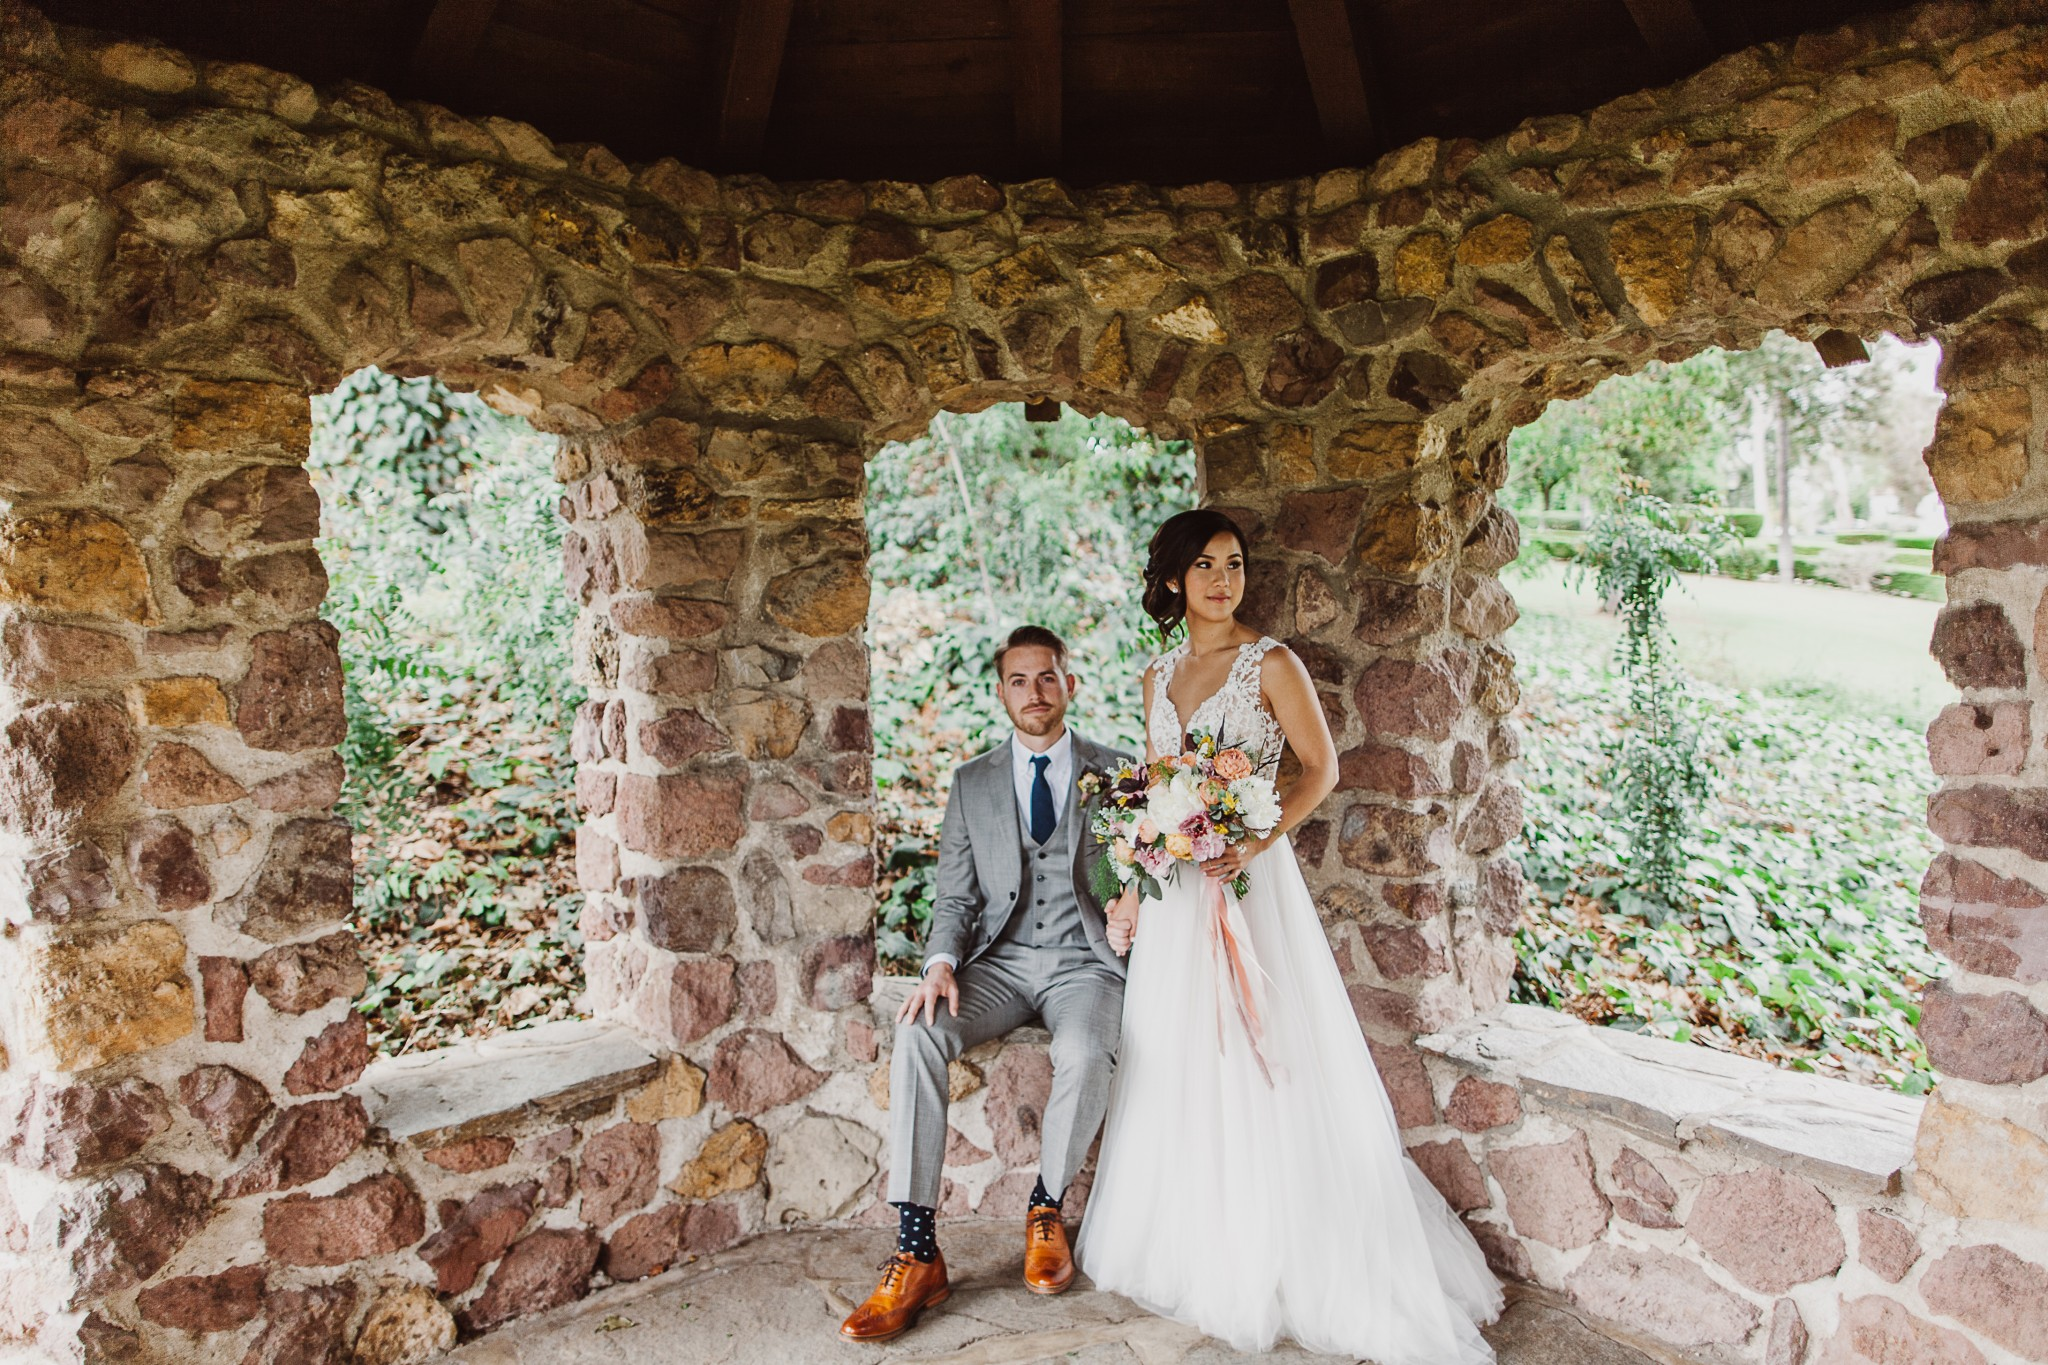 IanMary-Married_stevecowellphoto-2133.jpg